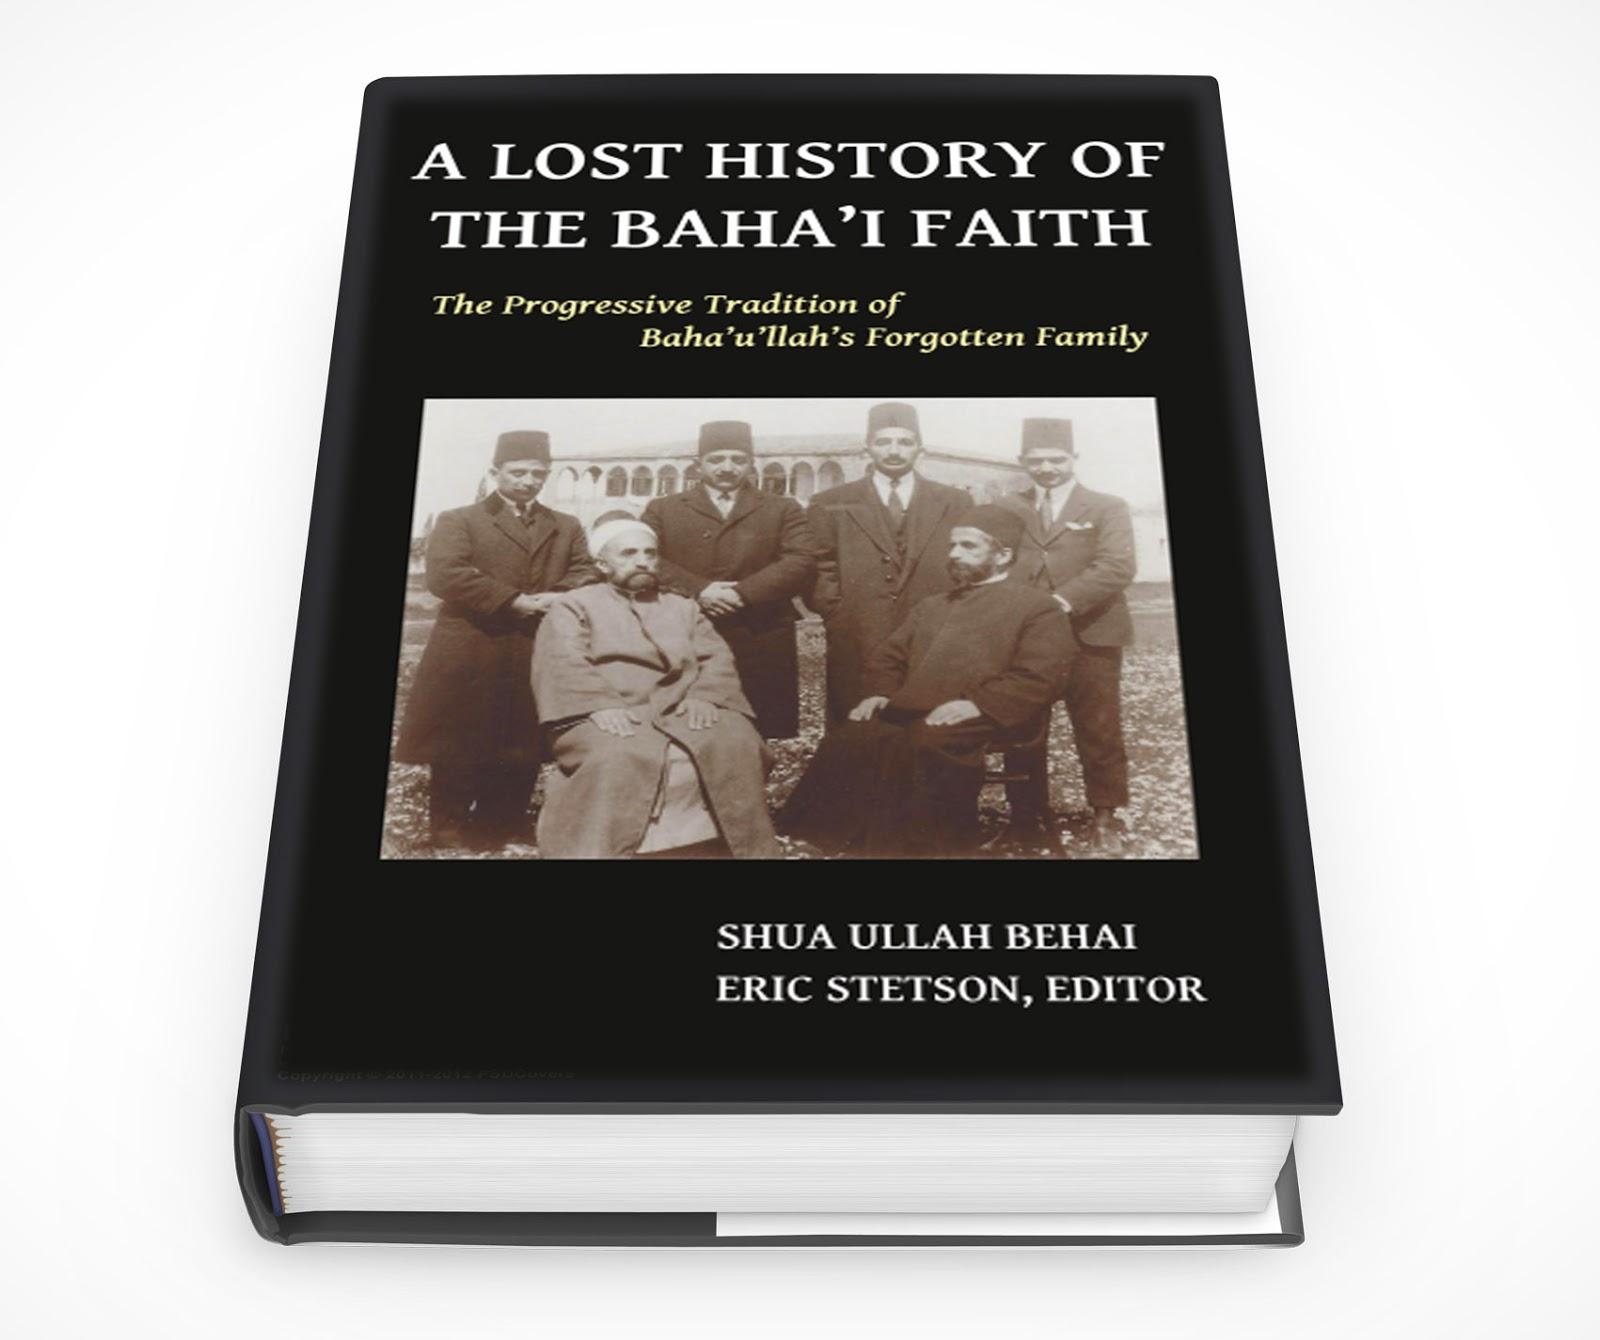 Unitarian Bahai's: A Lost History of the Baha'i Faith